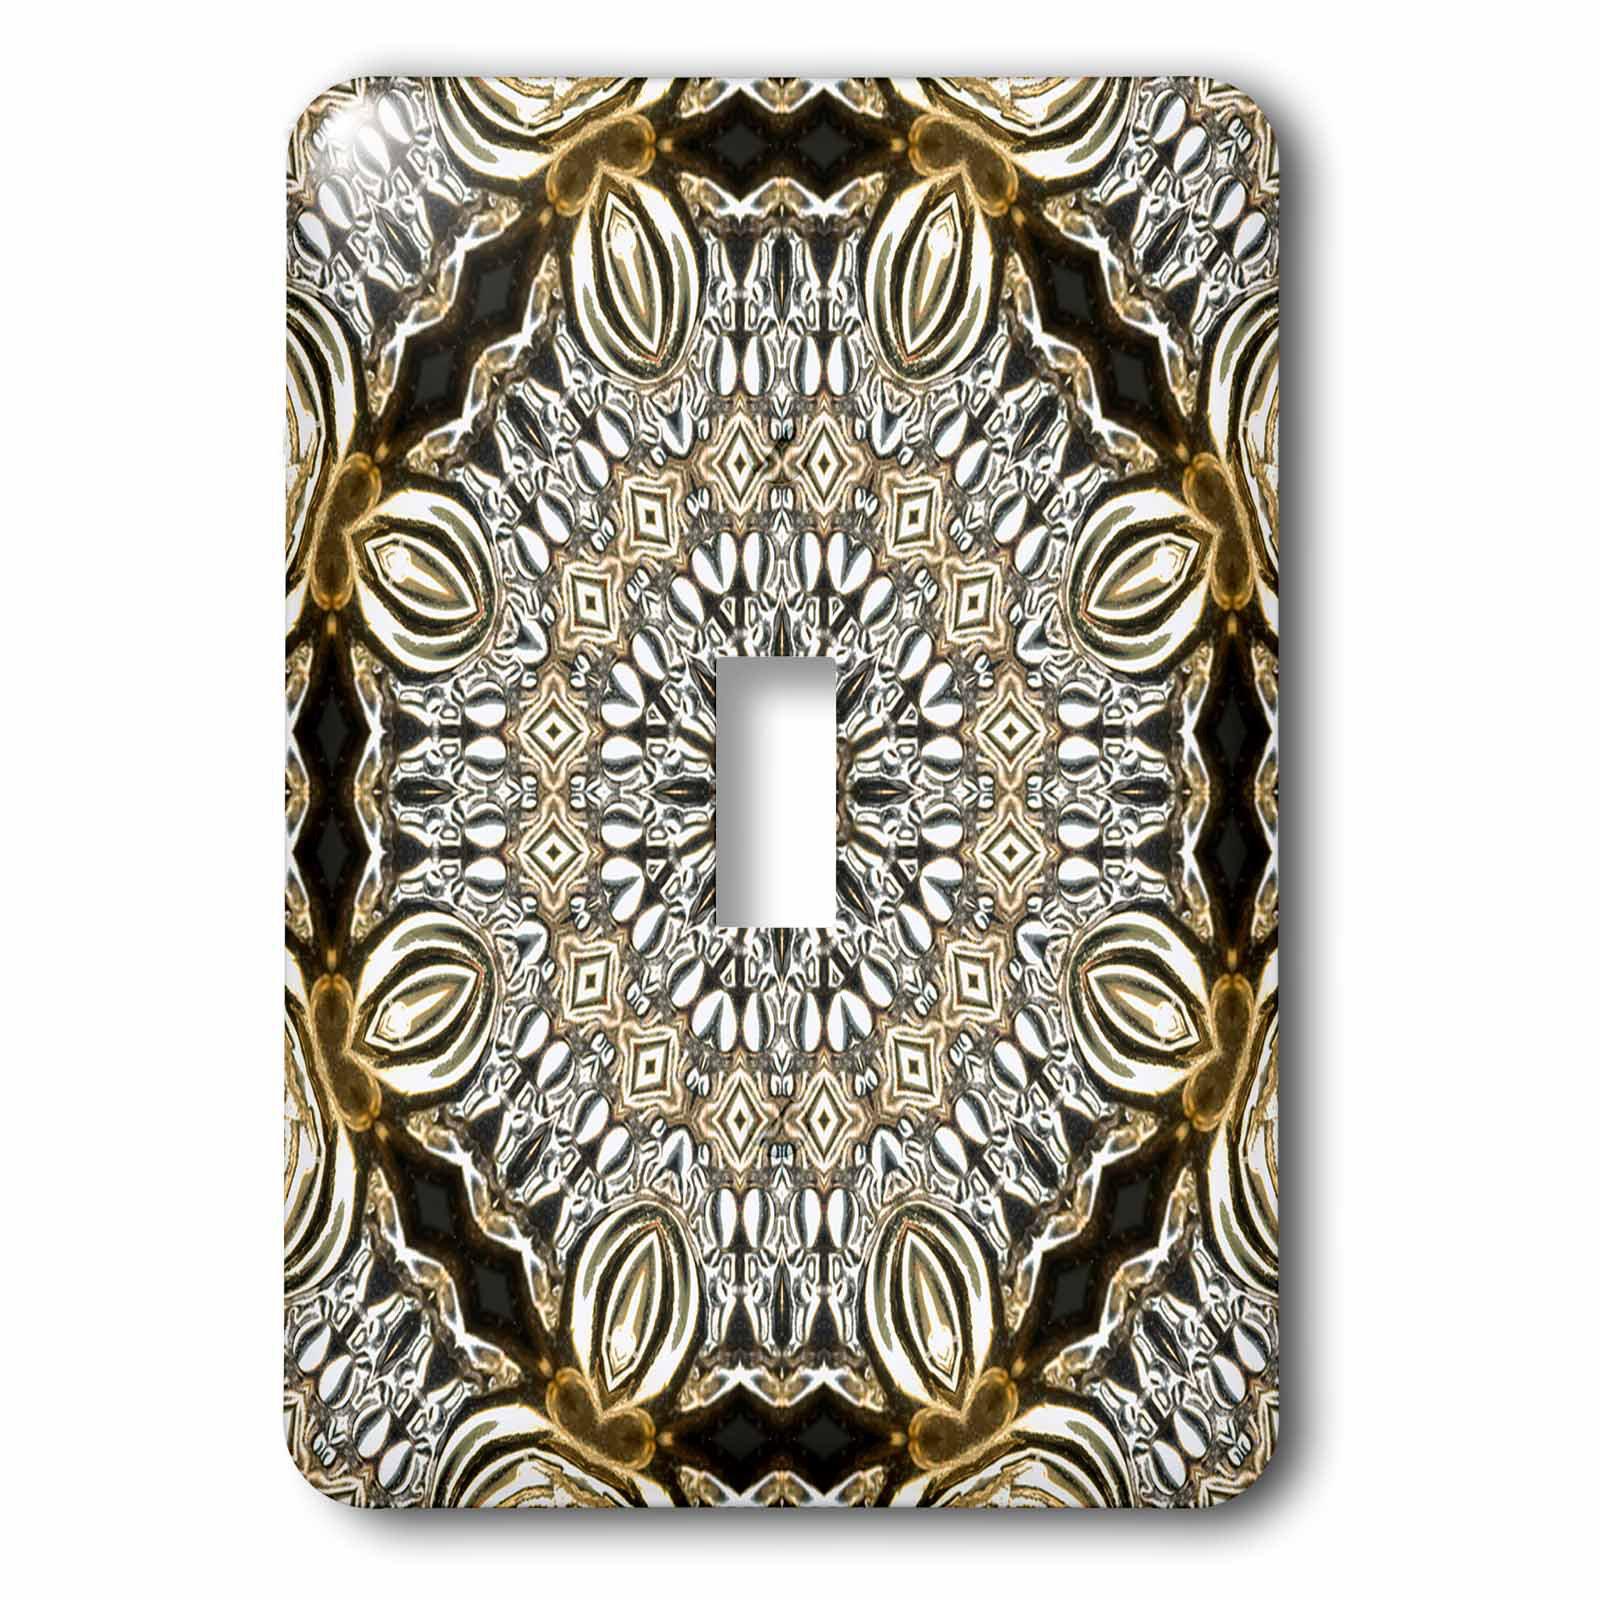 3drose Jewelry Elegant Mandala 1 Gang Toggle Light Switch Wall Plate Reviews Wayfair